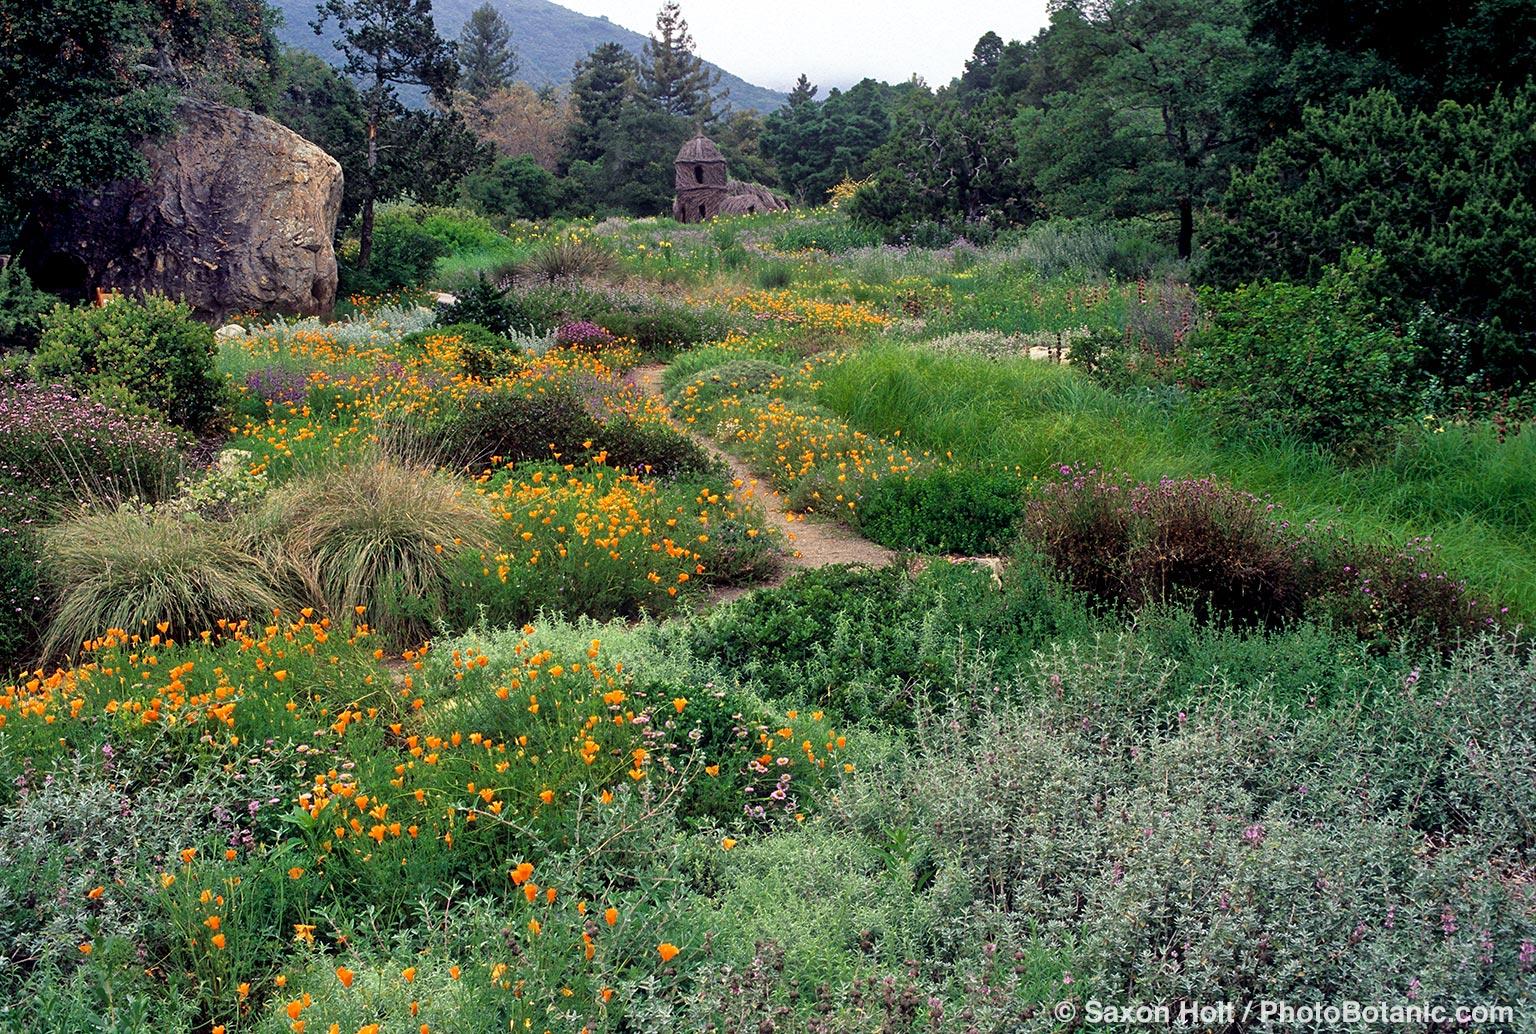 Landscaping With Native Plants : Santa barbara botanic garden caifornia native plant